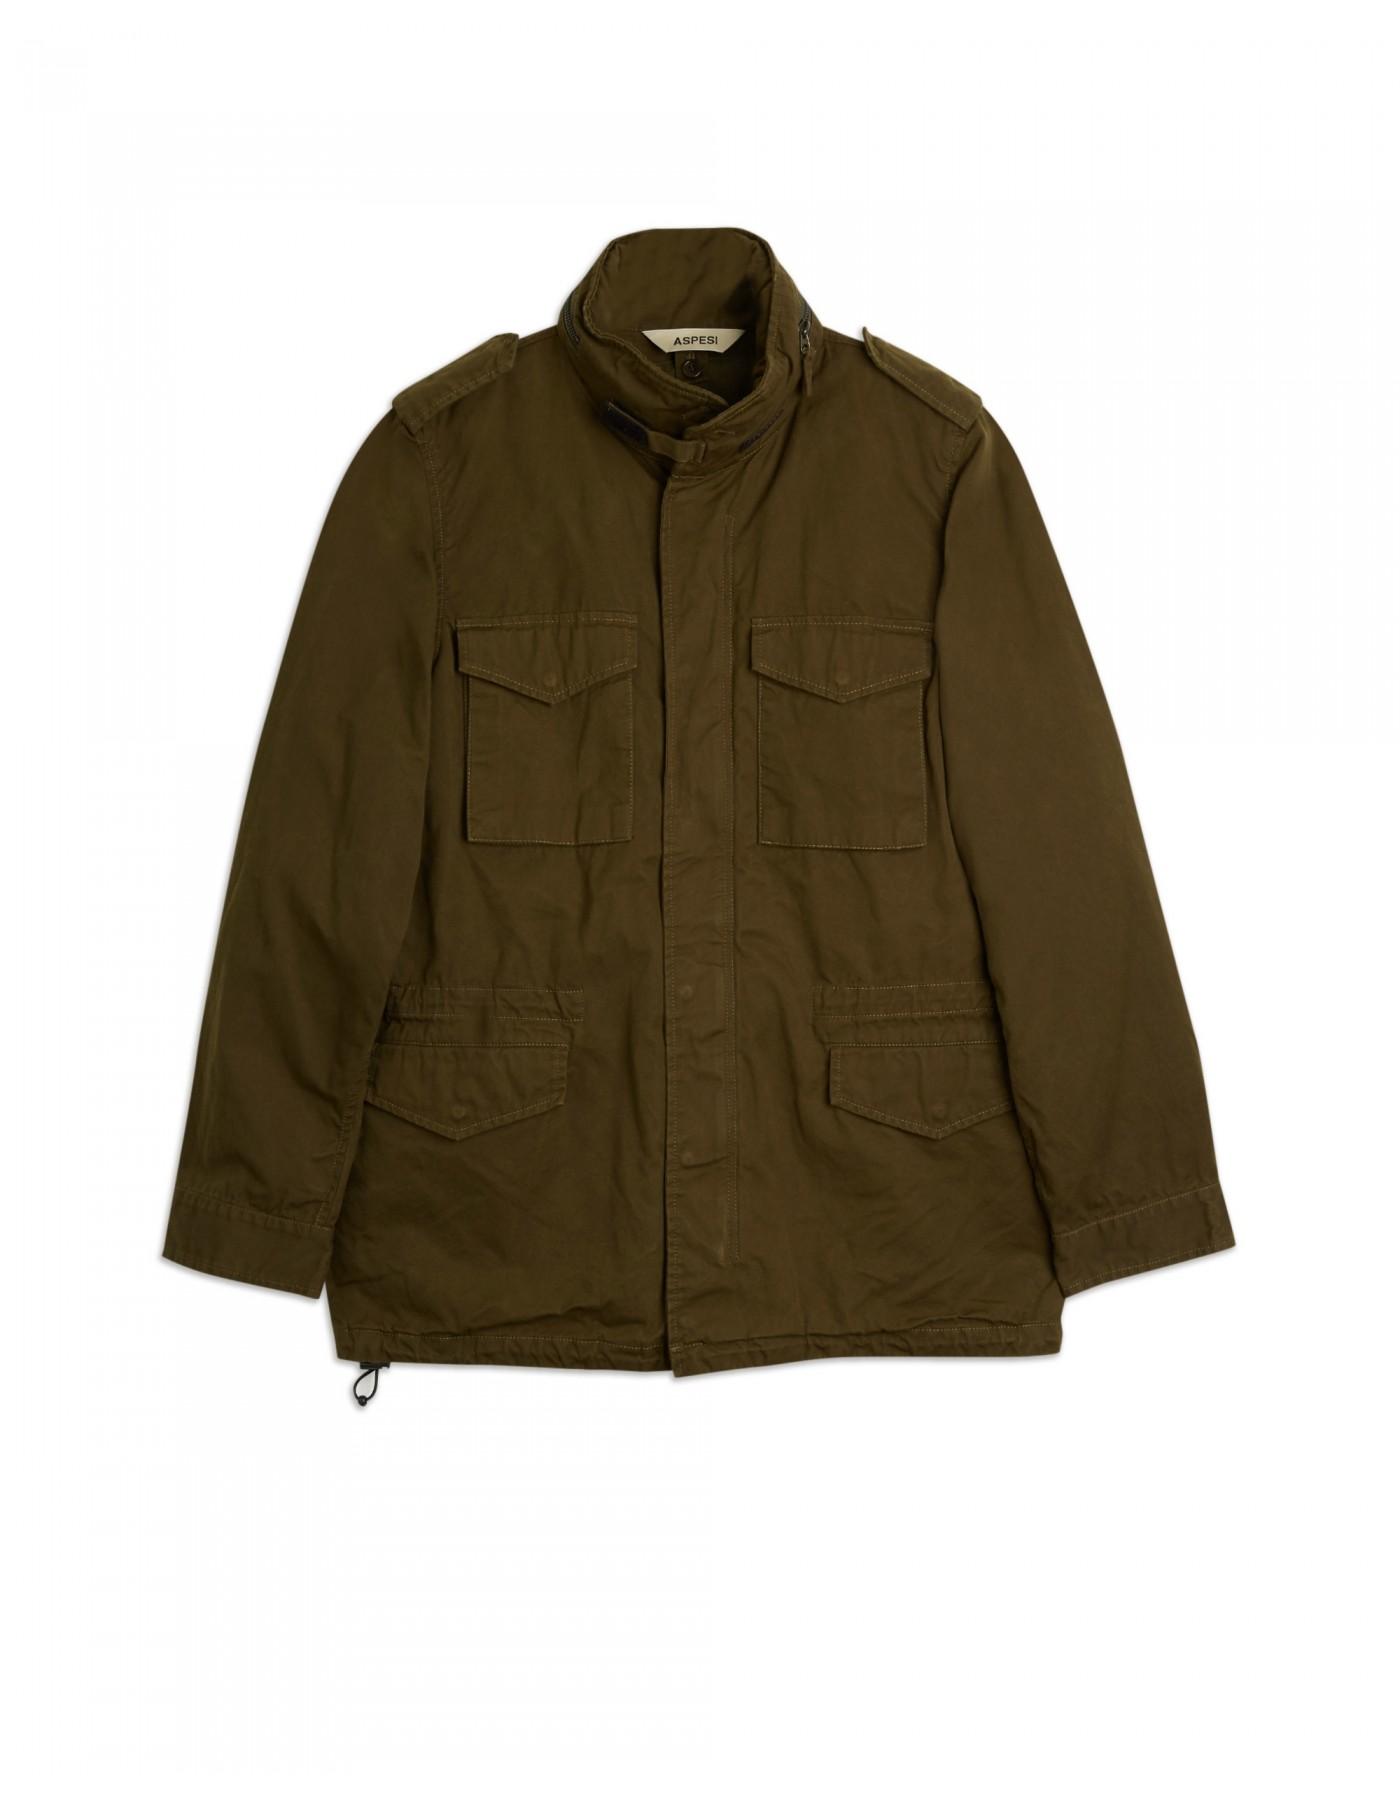 aspesi_m65_cotton_padded_field_jacket_olive_1.jpg